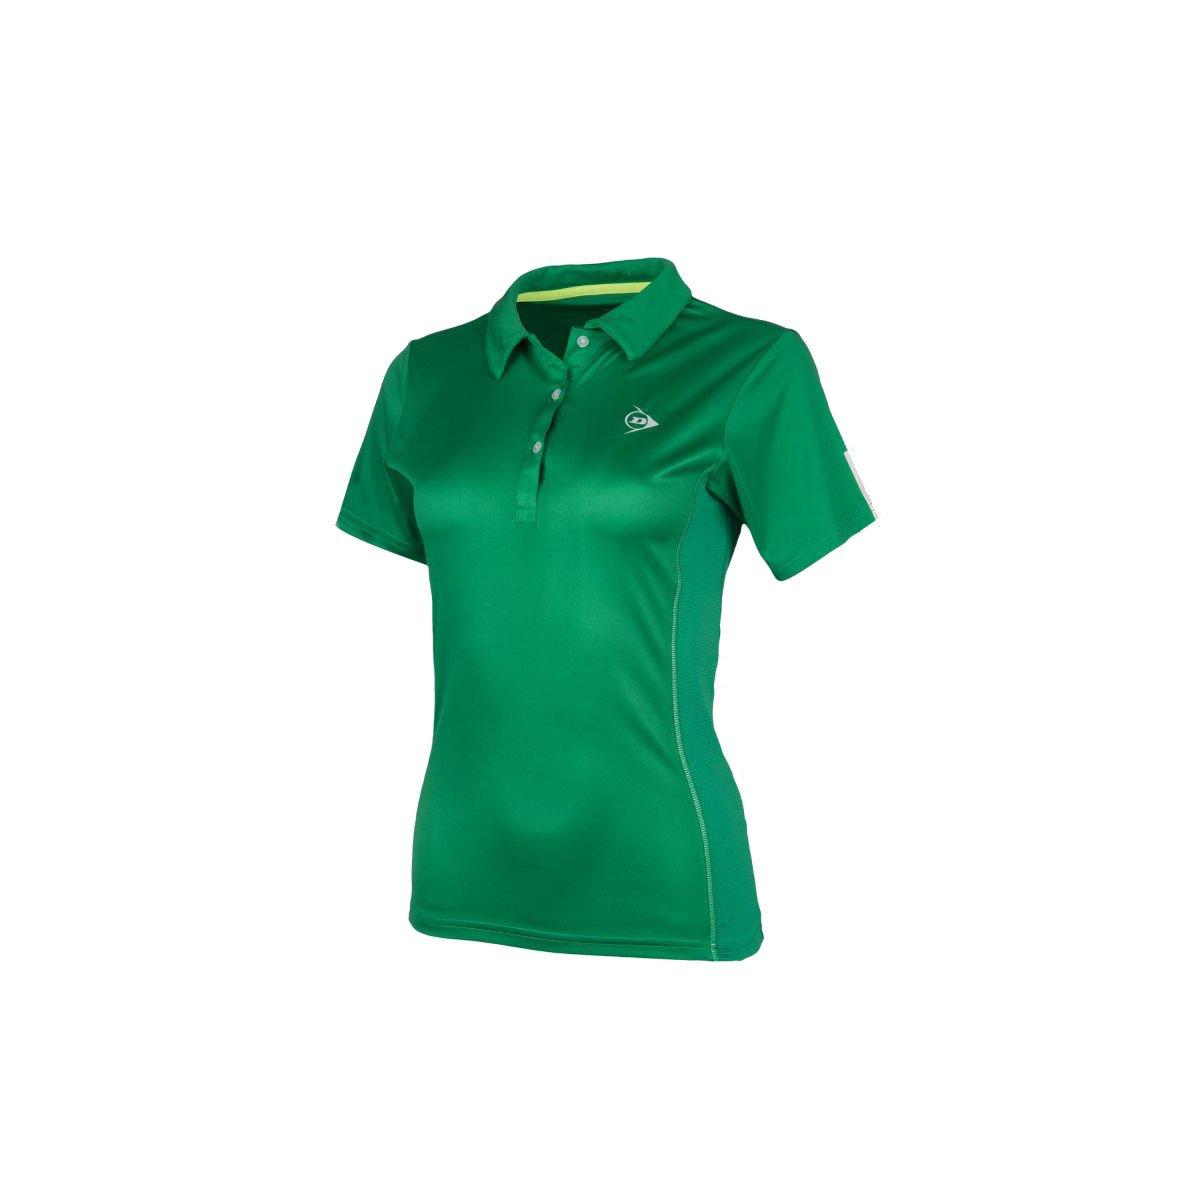 Dunlop Women's Club Collection Polo Tennis Shirt (Green)